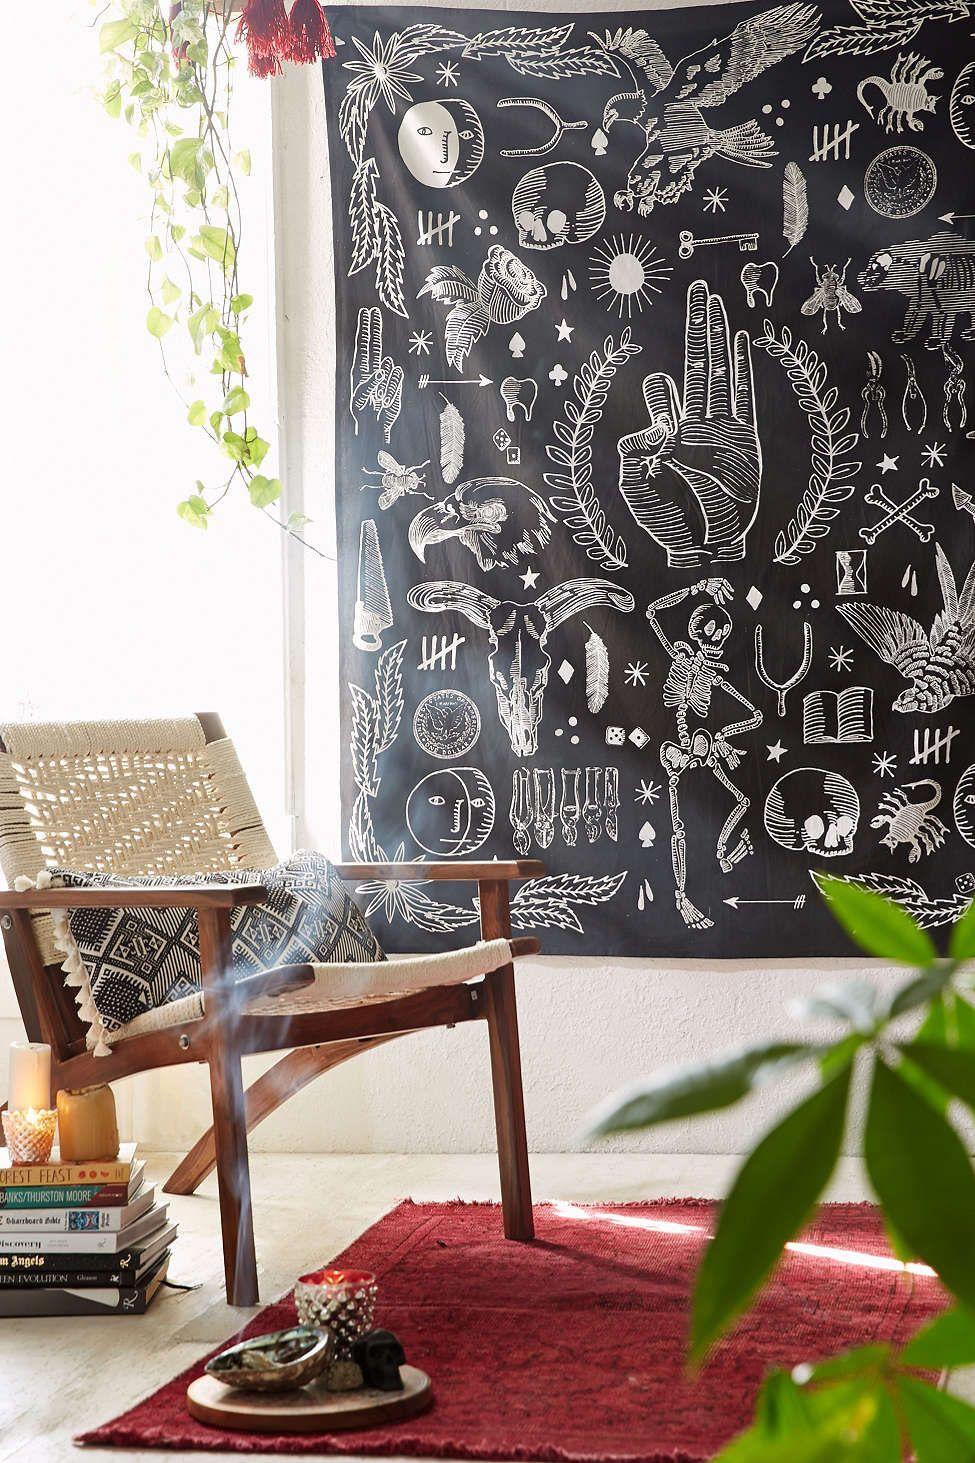 4040 Locust Tattoo Tapestry Decor Room Decor Home Decor